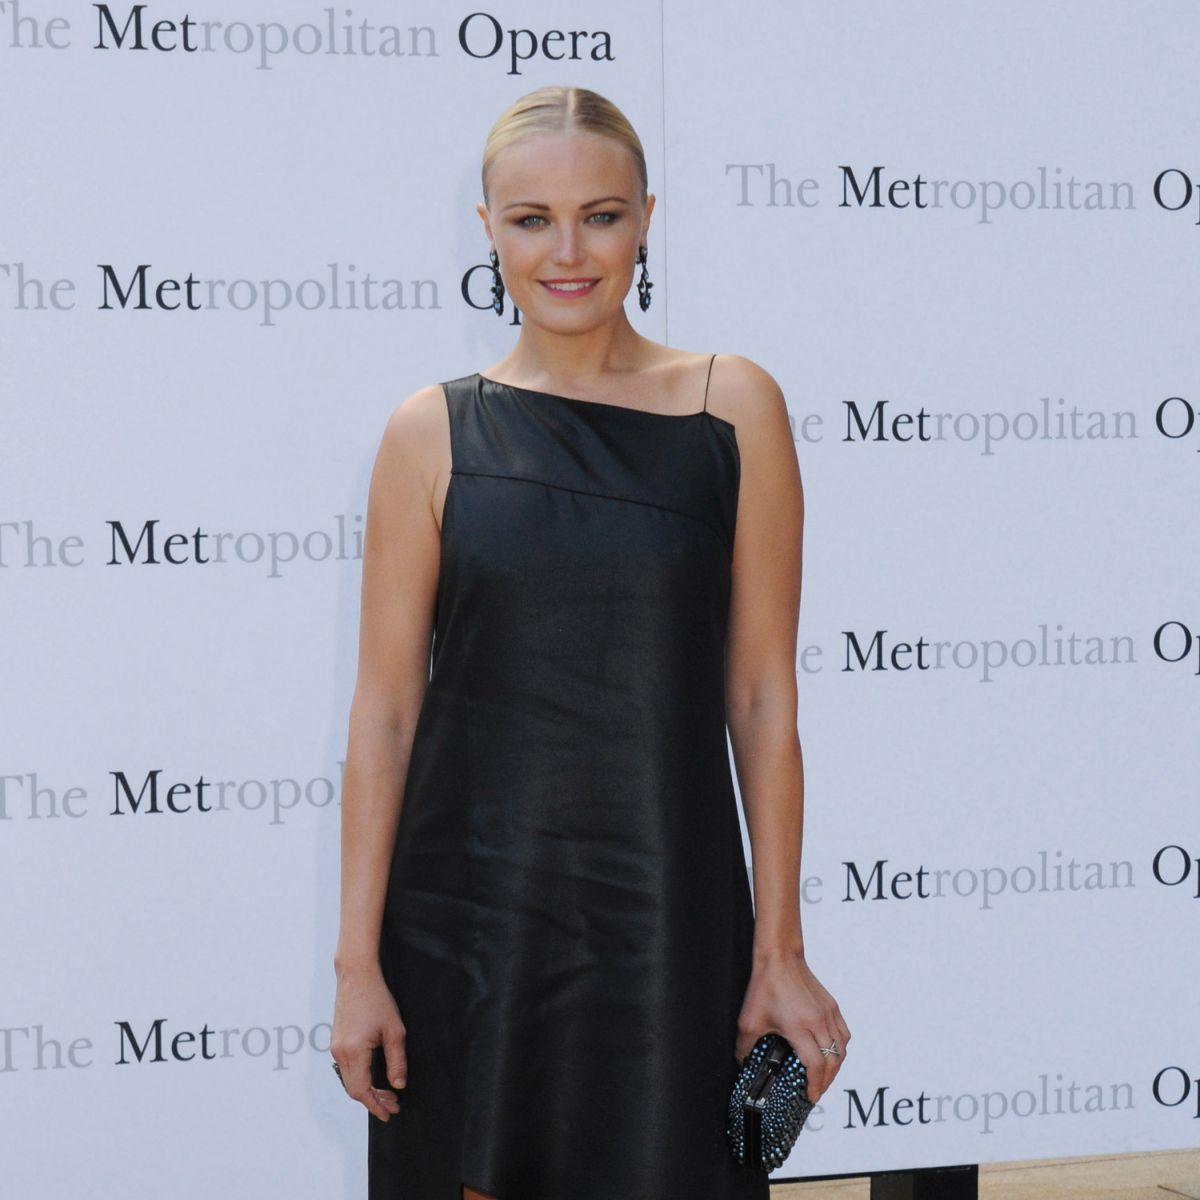 MALIN AKERMAN at Metropolitan Opera 2016-17 Opening Night at Lincoln Center in New York 09/26/2016